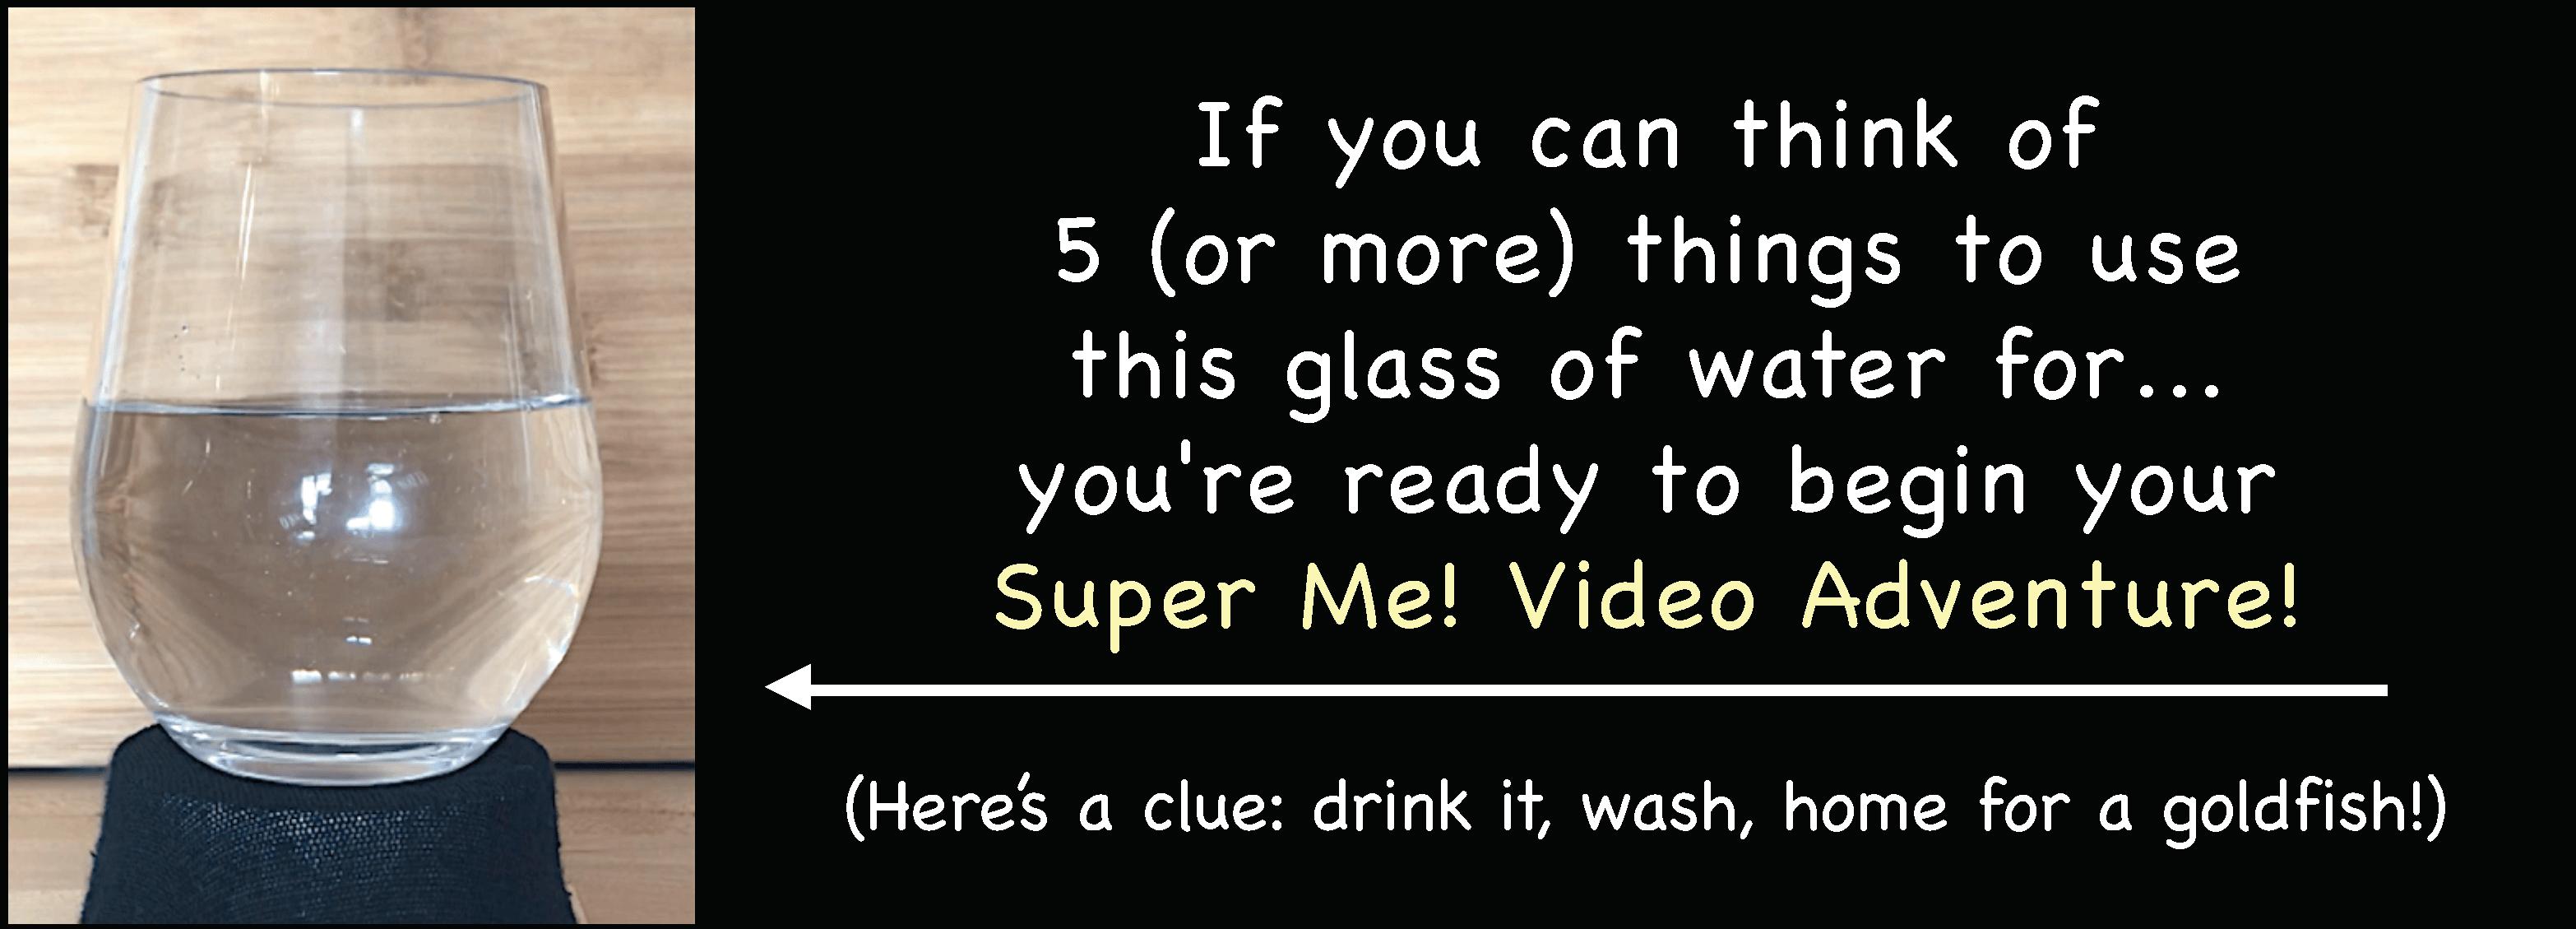 Super Me! Video Adventure